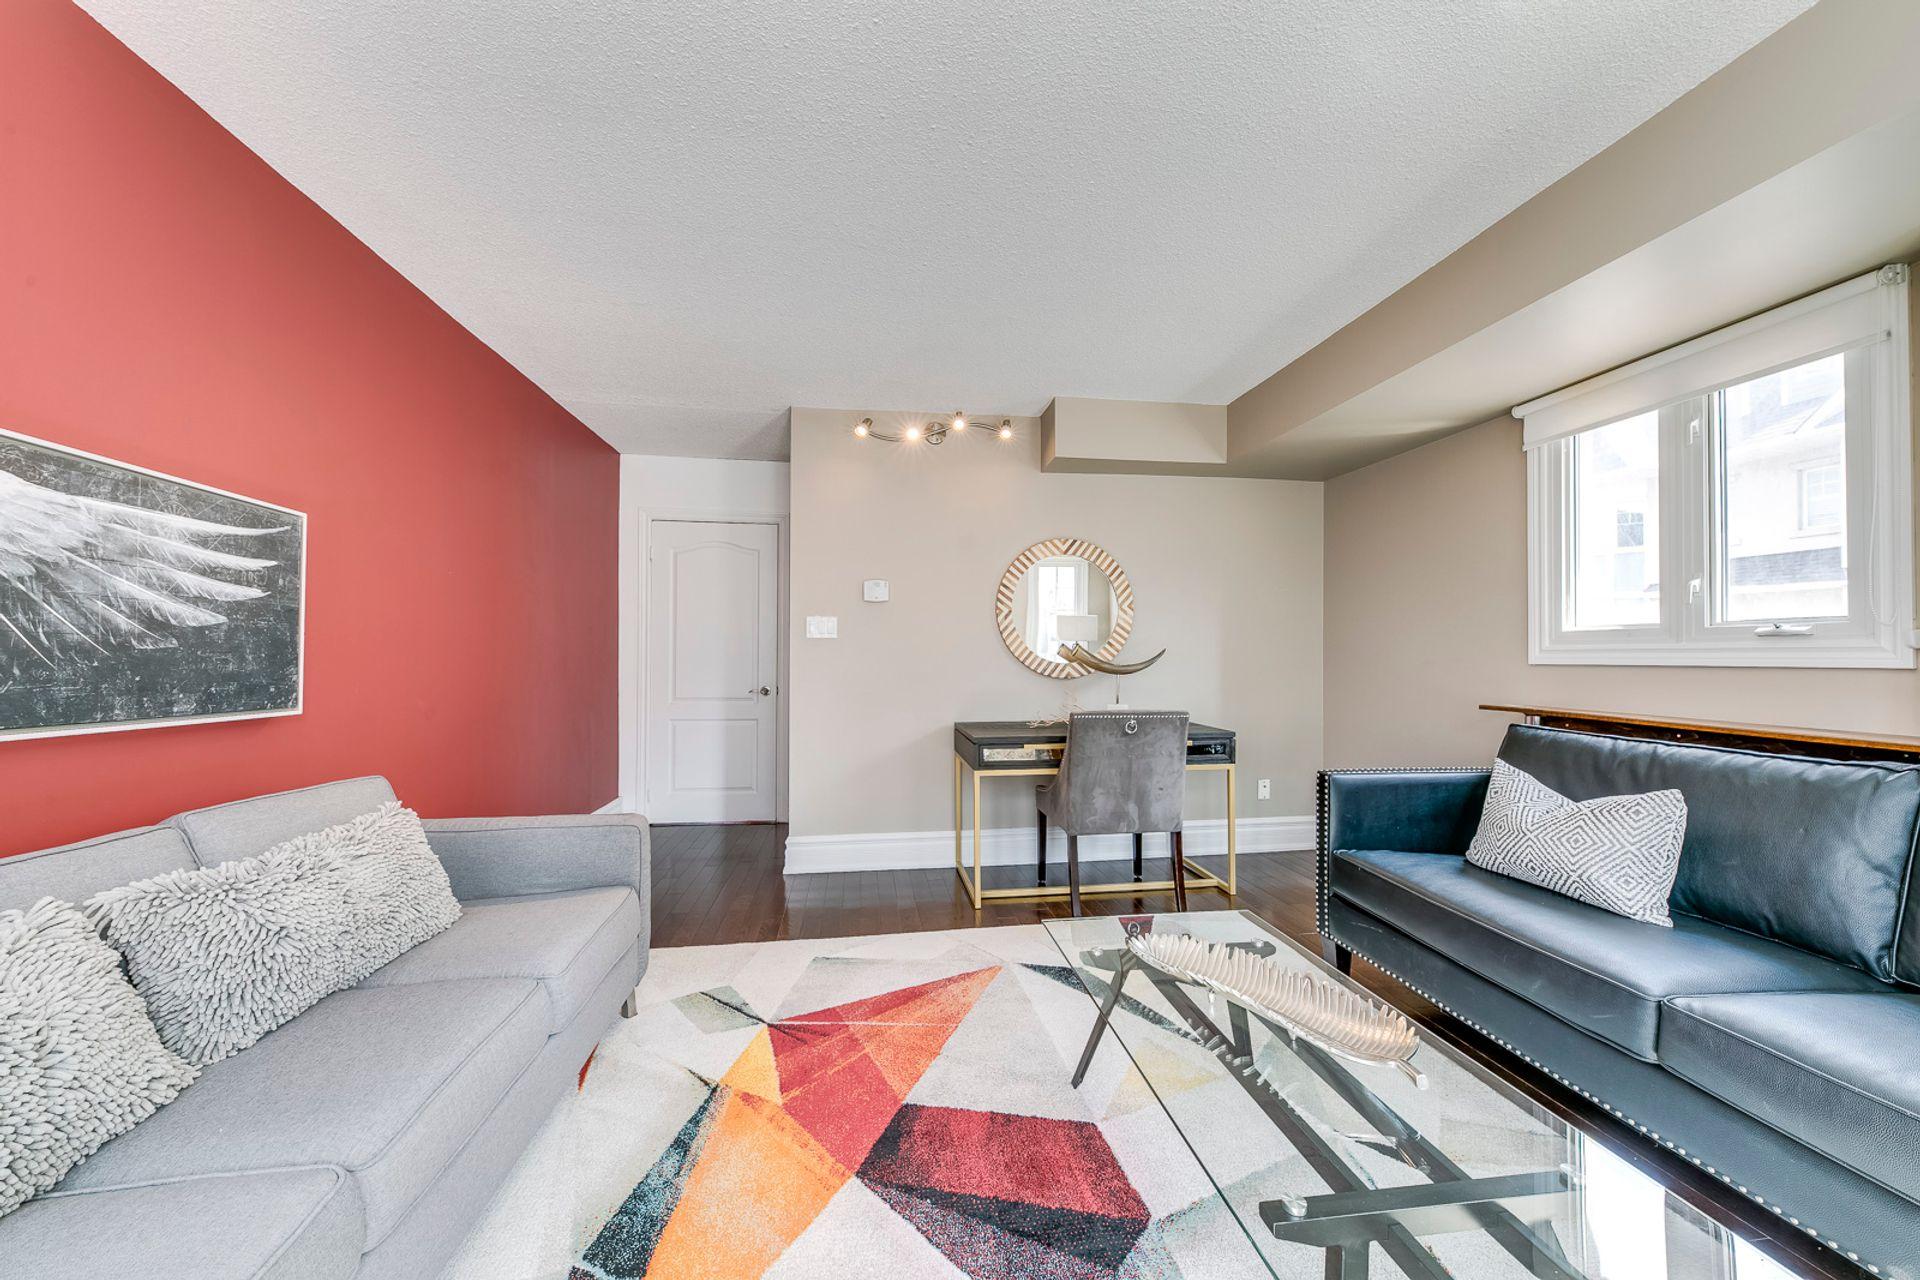 Living Room - 7 - 840 Dundas St W, Mississauga - Elite3 & Team at 7 - 840 Dundas Street W, Erindale, Mississauga